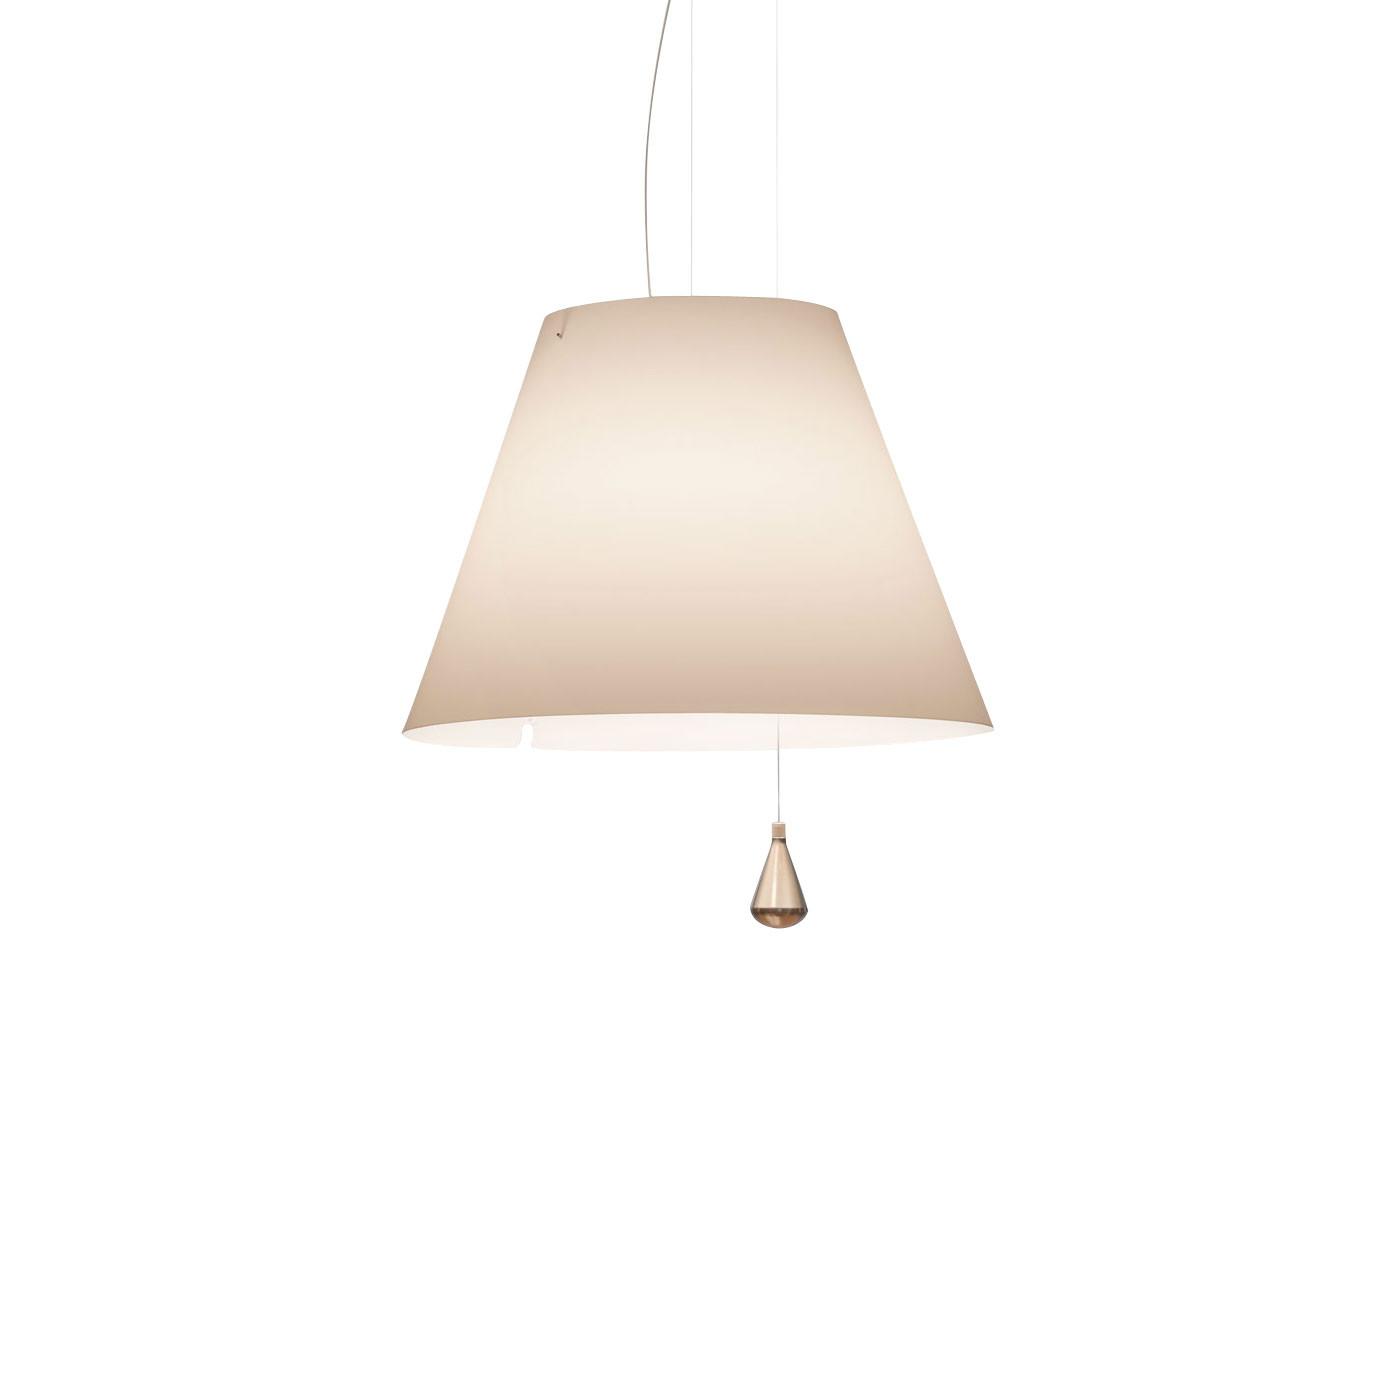 Costanza Luceplan Sospensione.Luceplan Lady Costanza Pendant Light